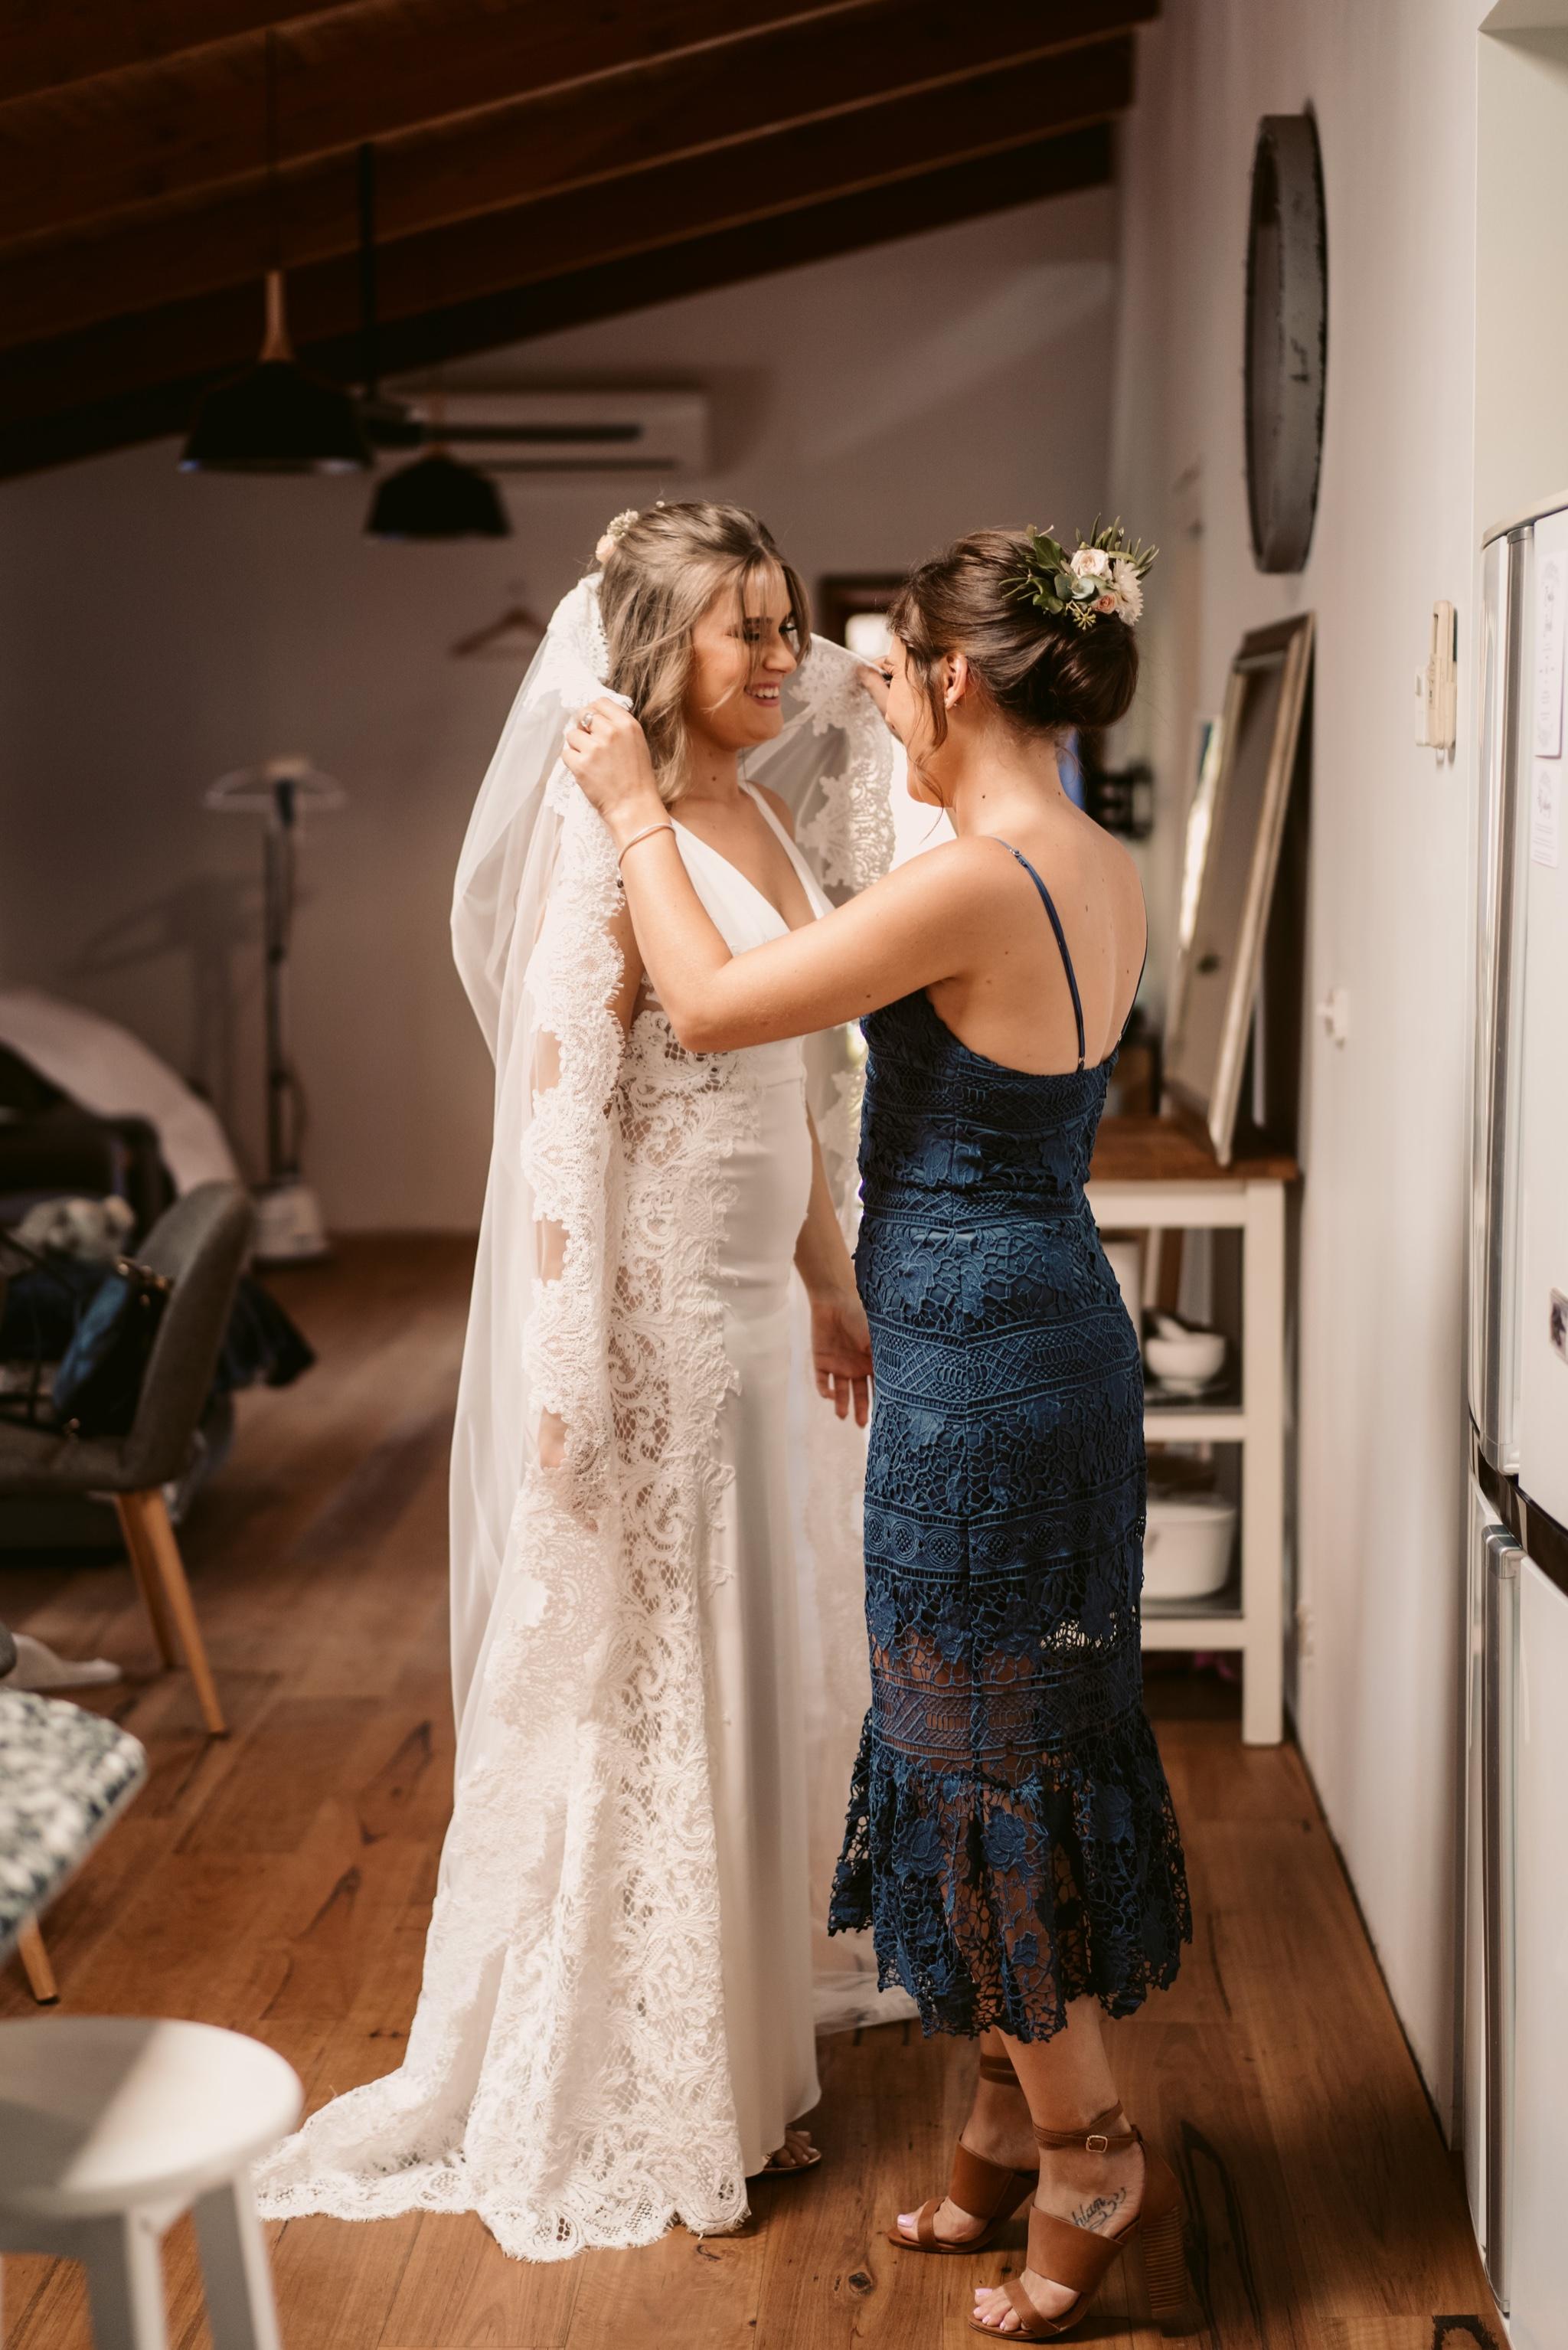 Mornington Peninsula Wedding Photography23.jpg